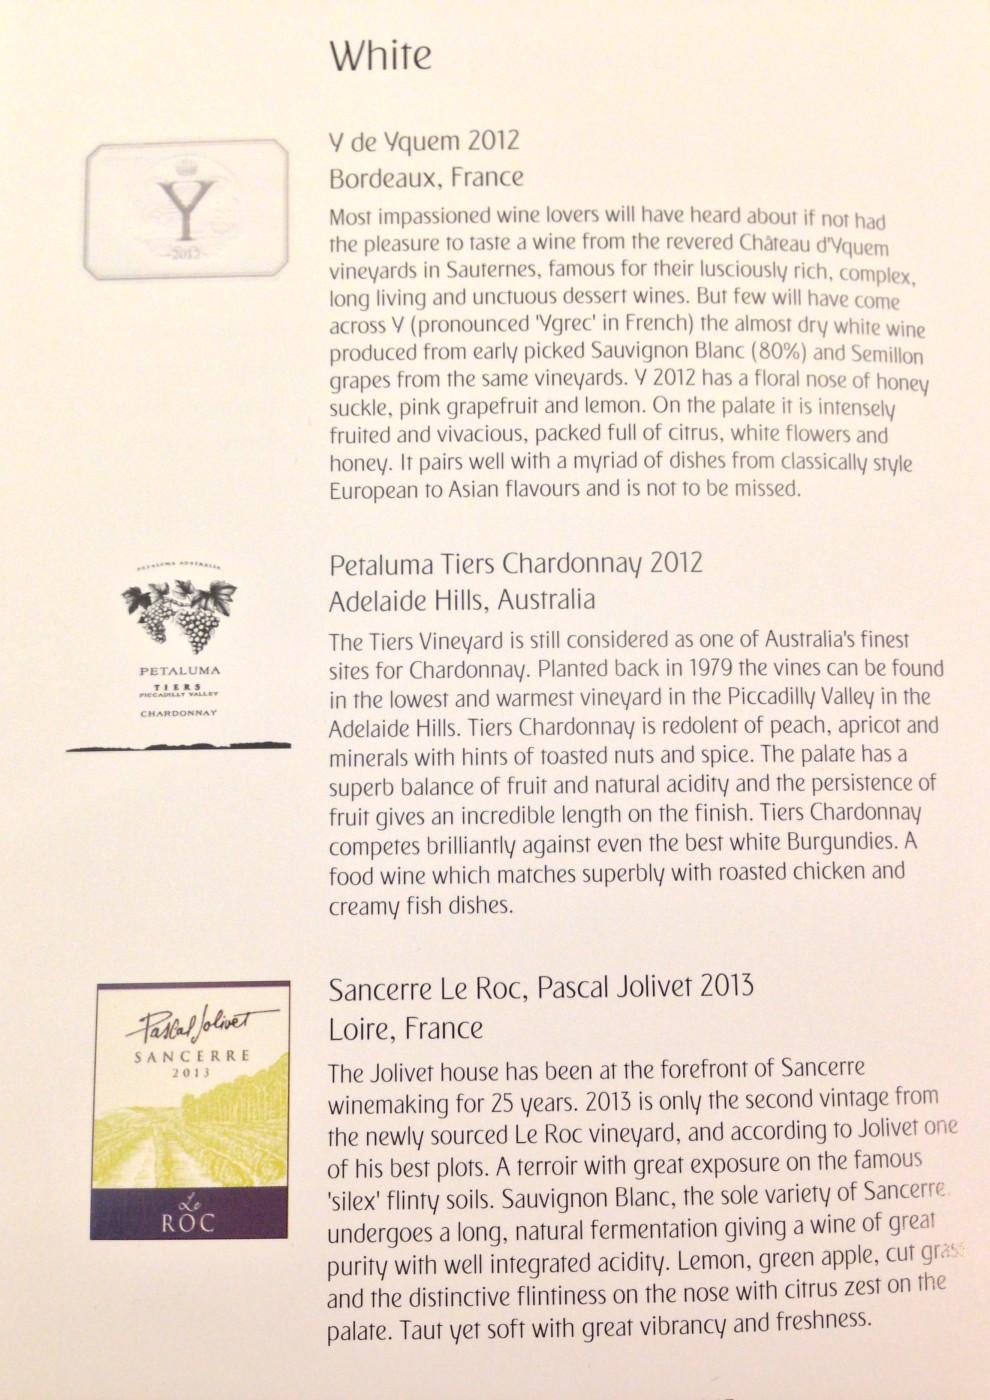 Emirates First Class White Wine List